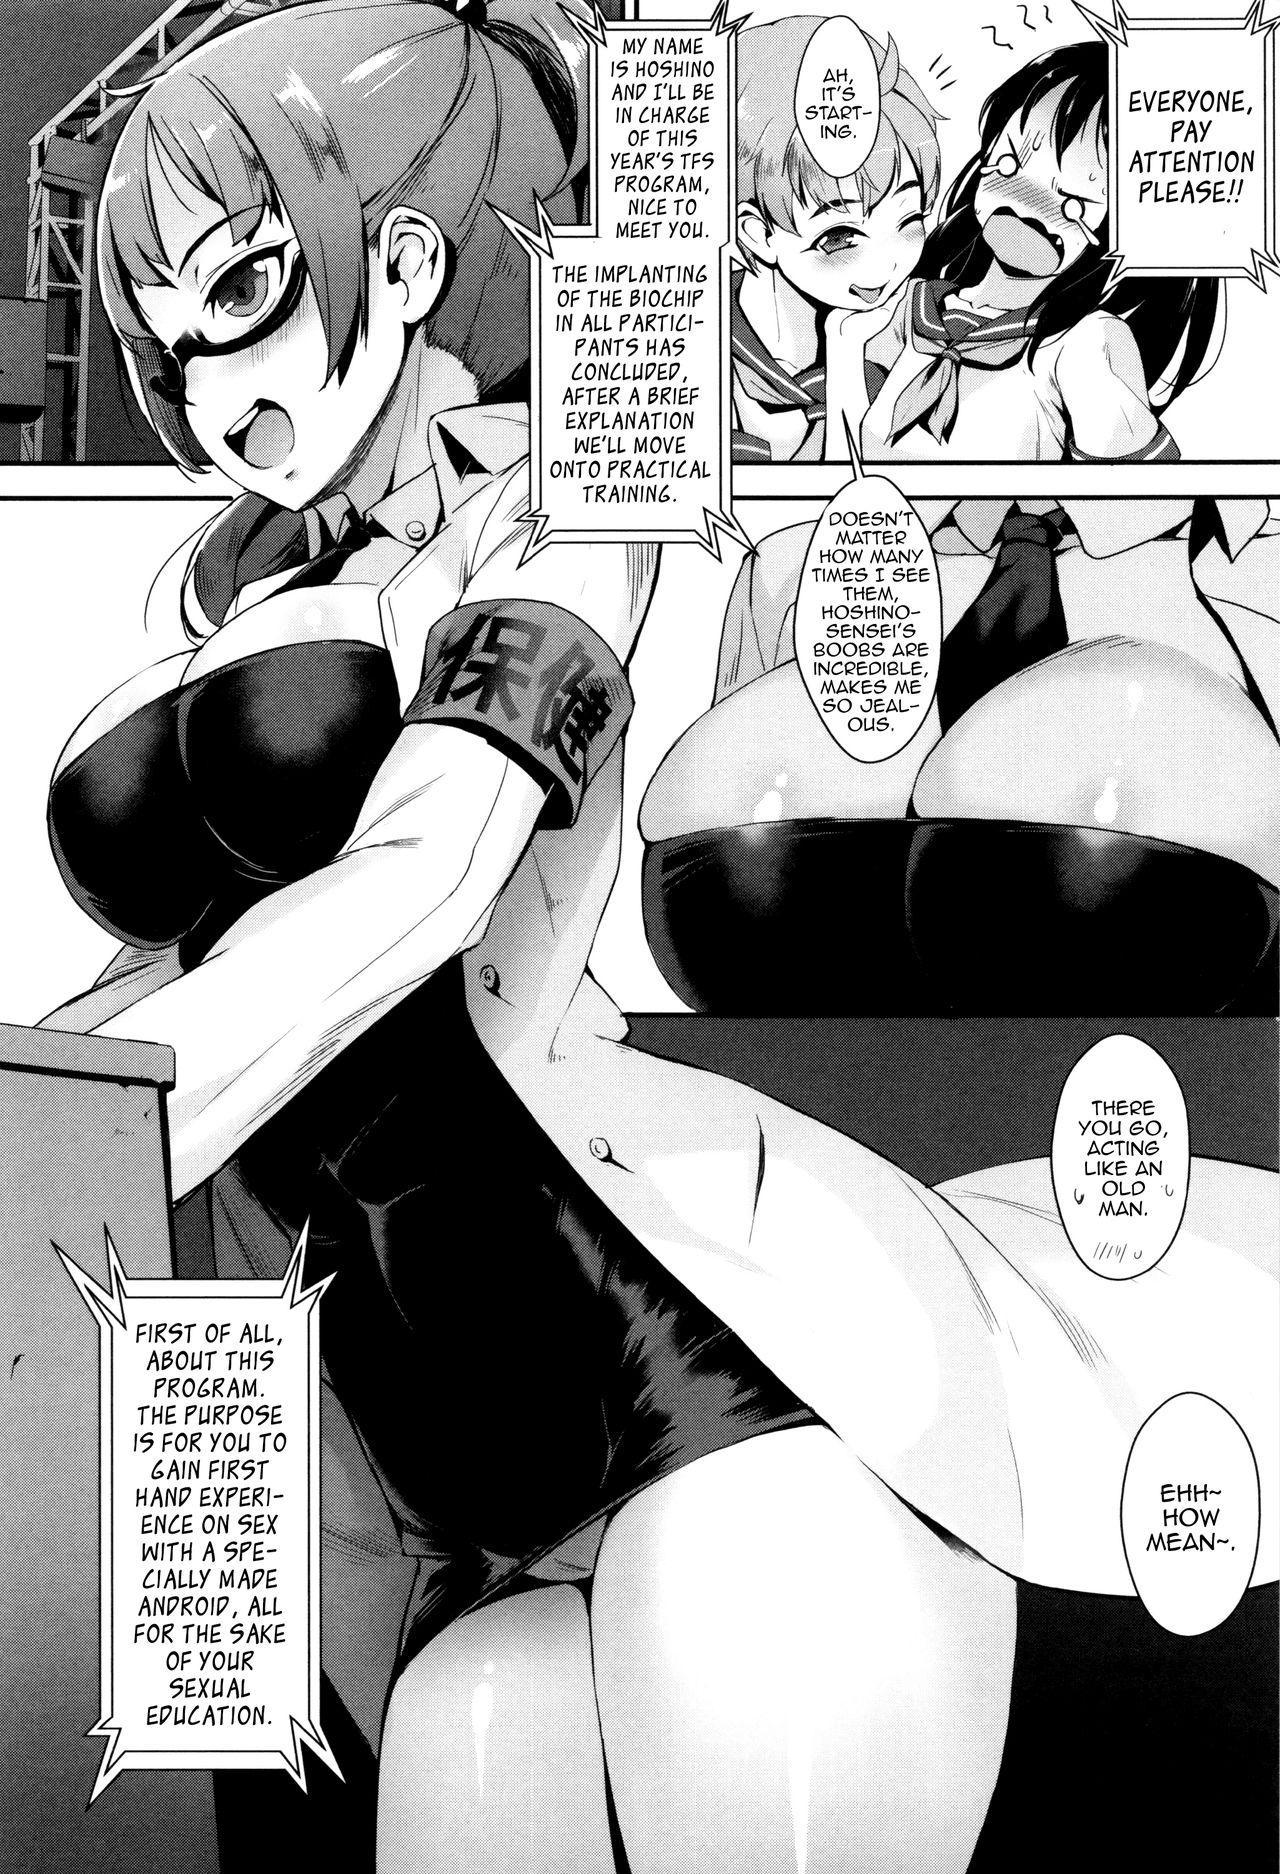 [Jairou] Erotic Training! ~Pakopako Rankou Seikyouiku~ Ch. 1-2 [English] [MrBubbles] 13